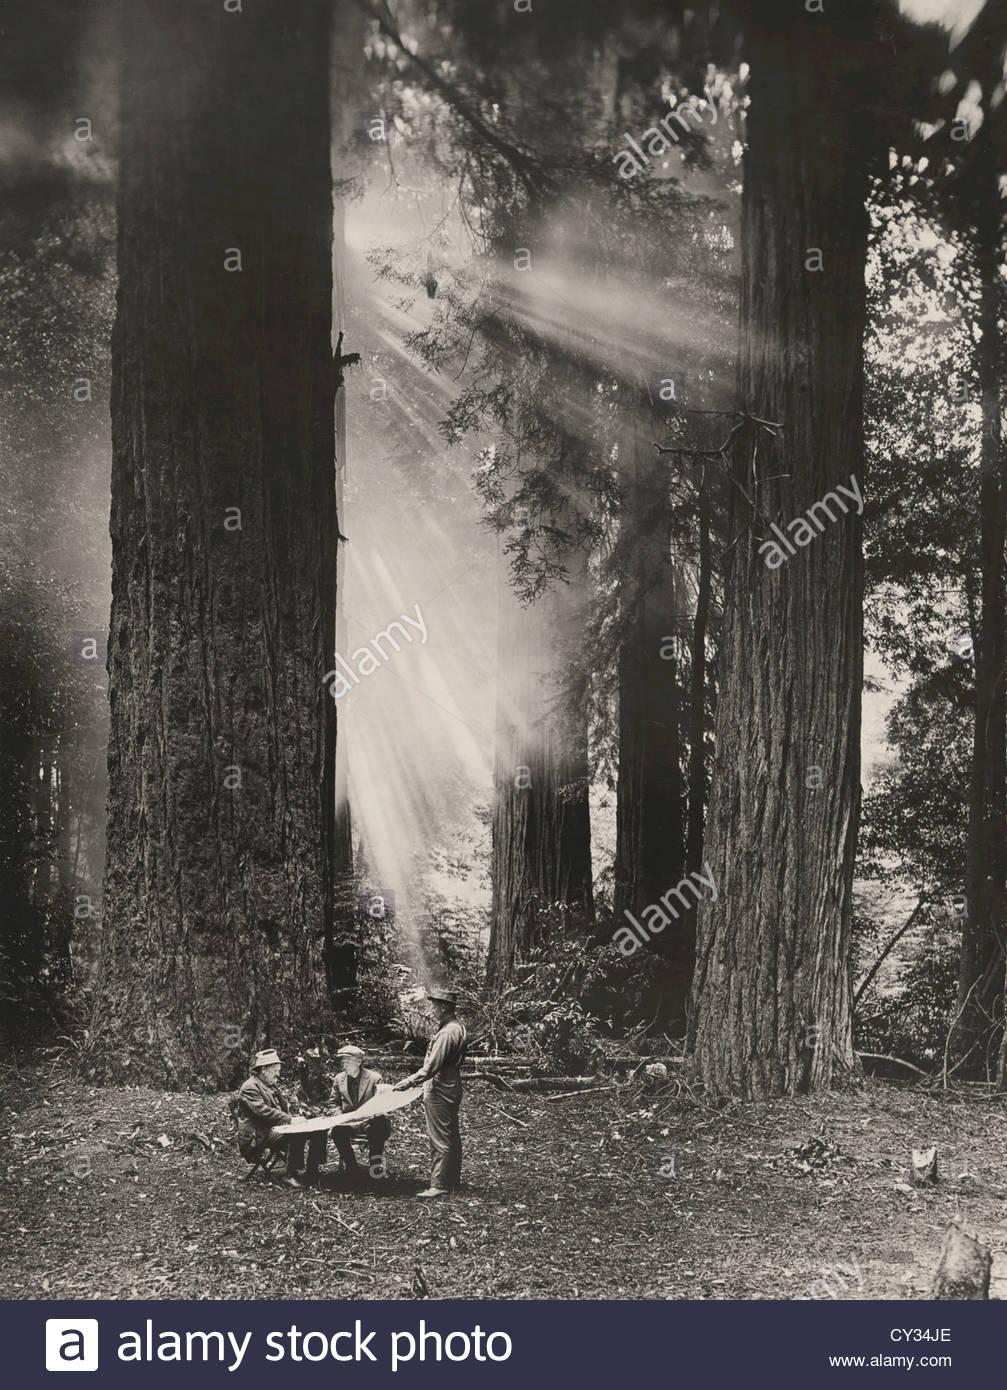 Men view map against giant redwoods as sunbeams break through fog. - Stock Image